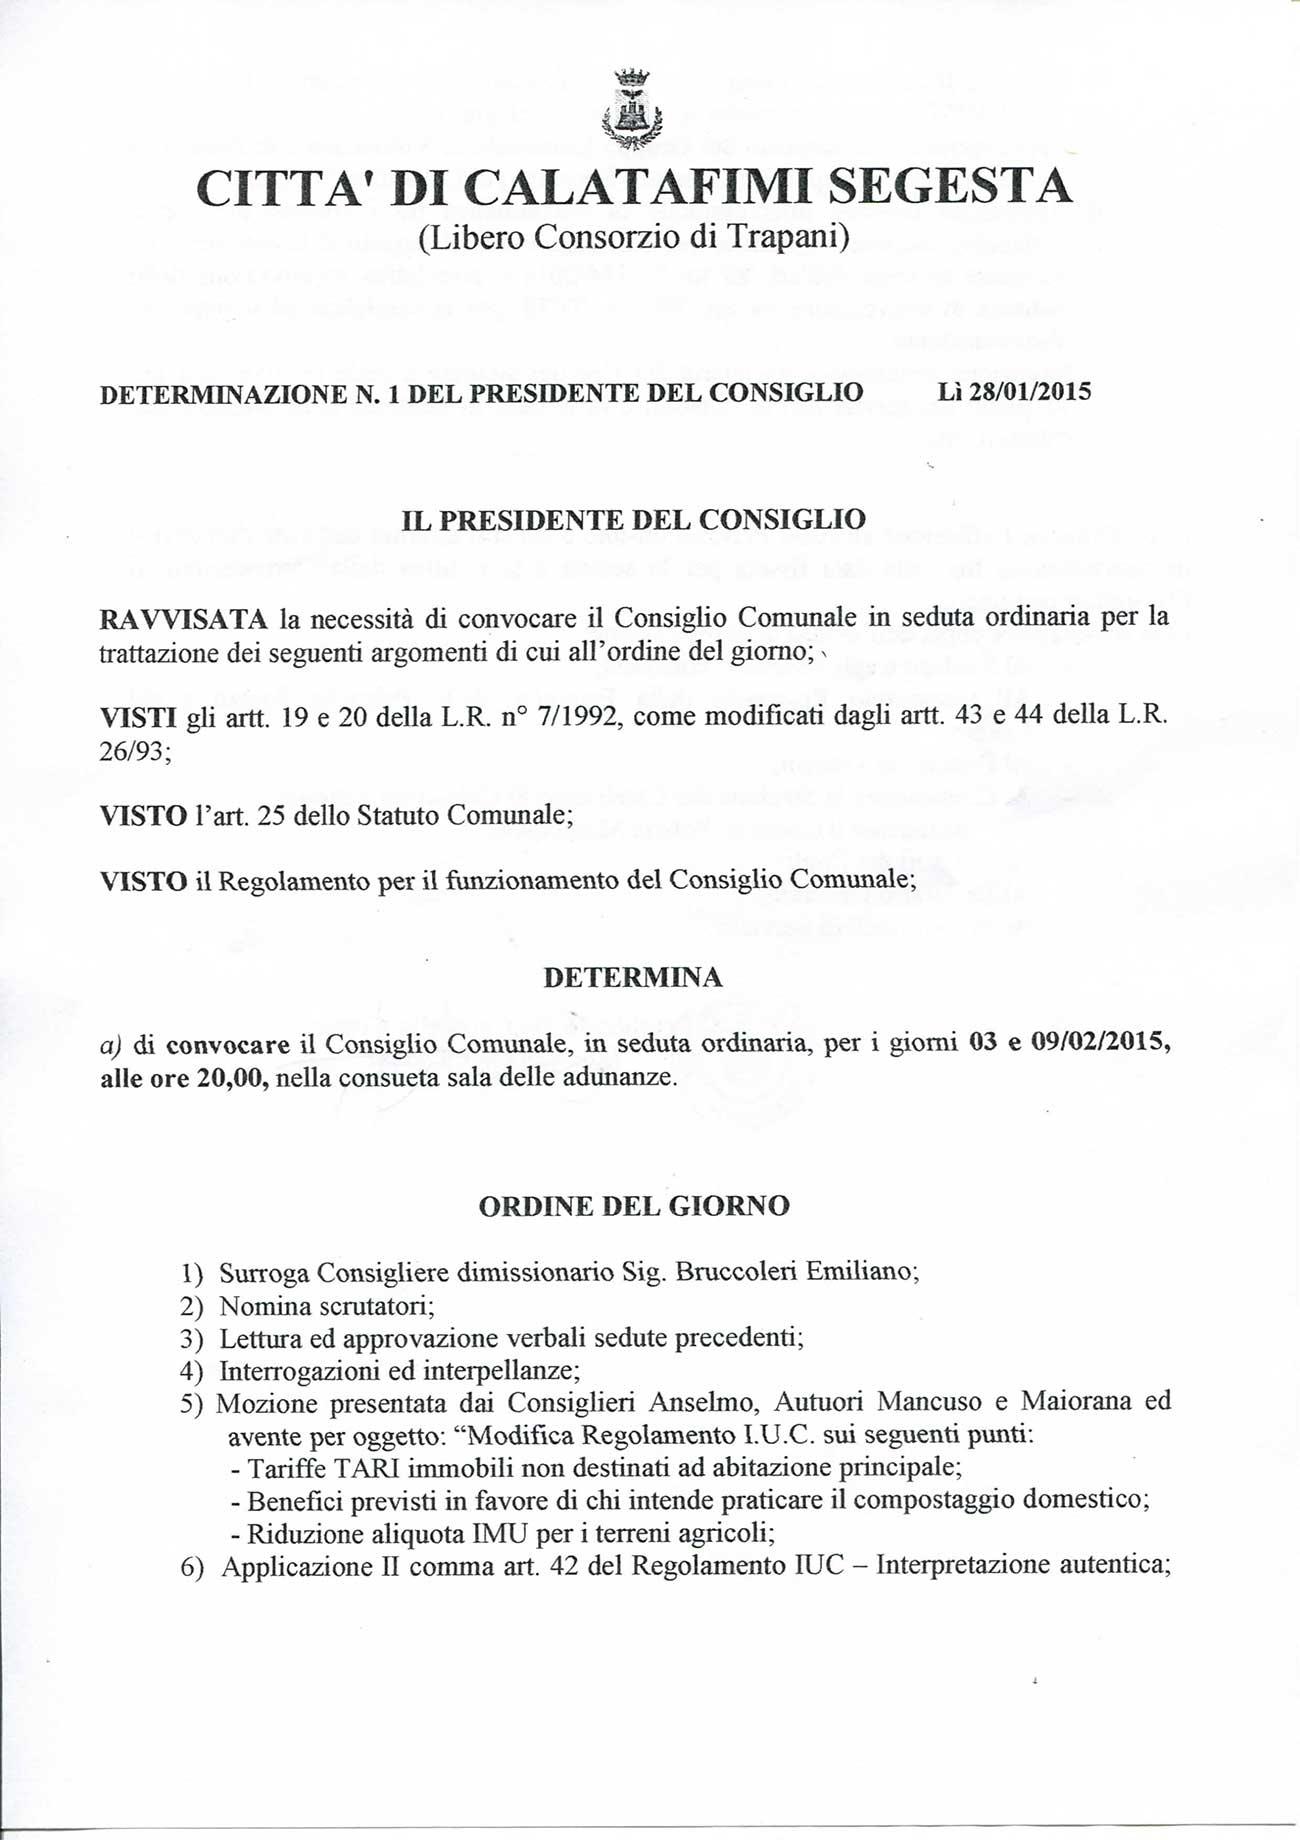 Consiglio-comuanale-3-febbraio-1